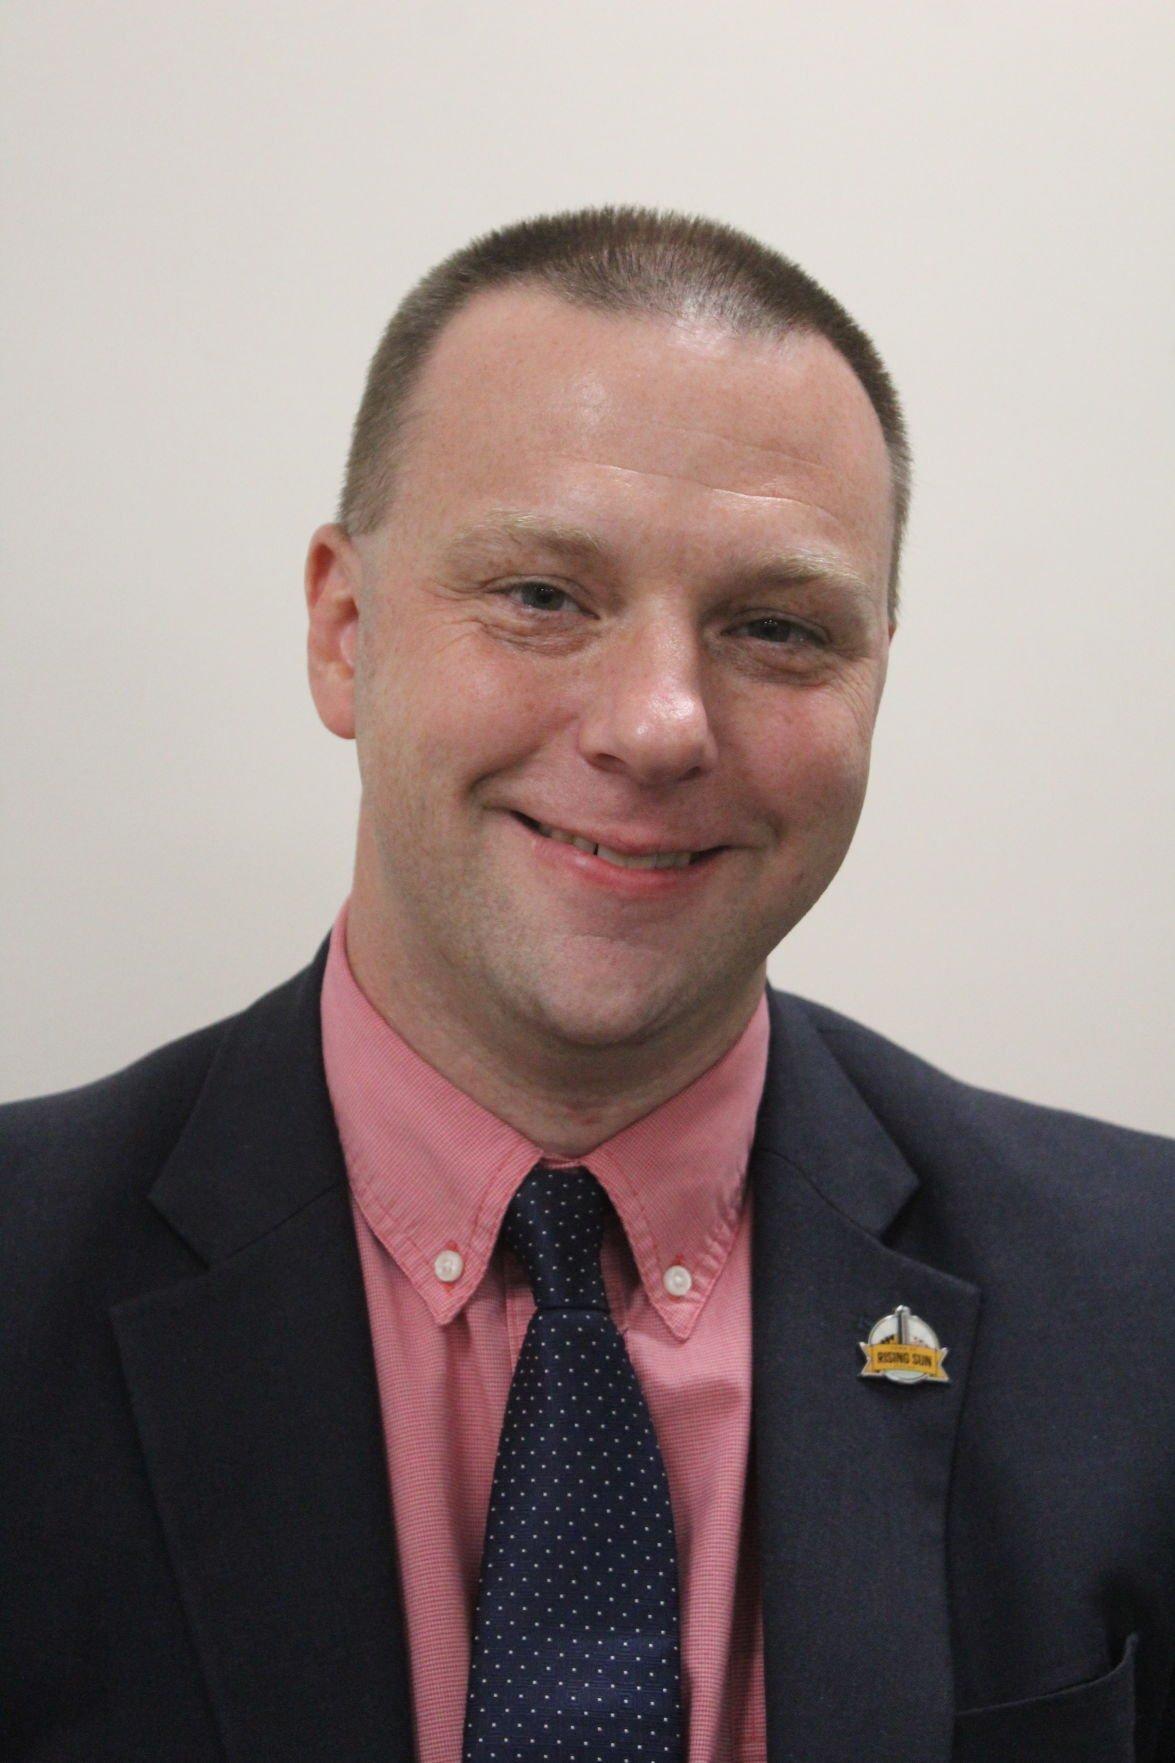 Rising Sun Commissioner David Warnick